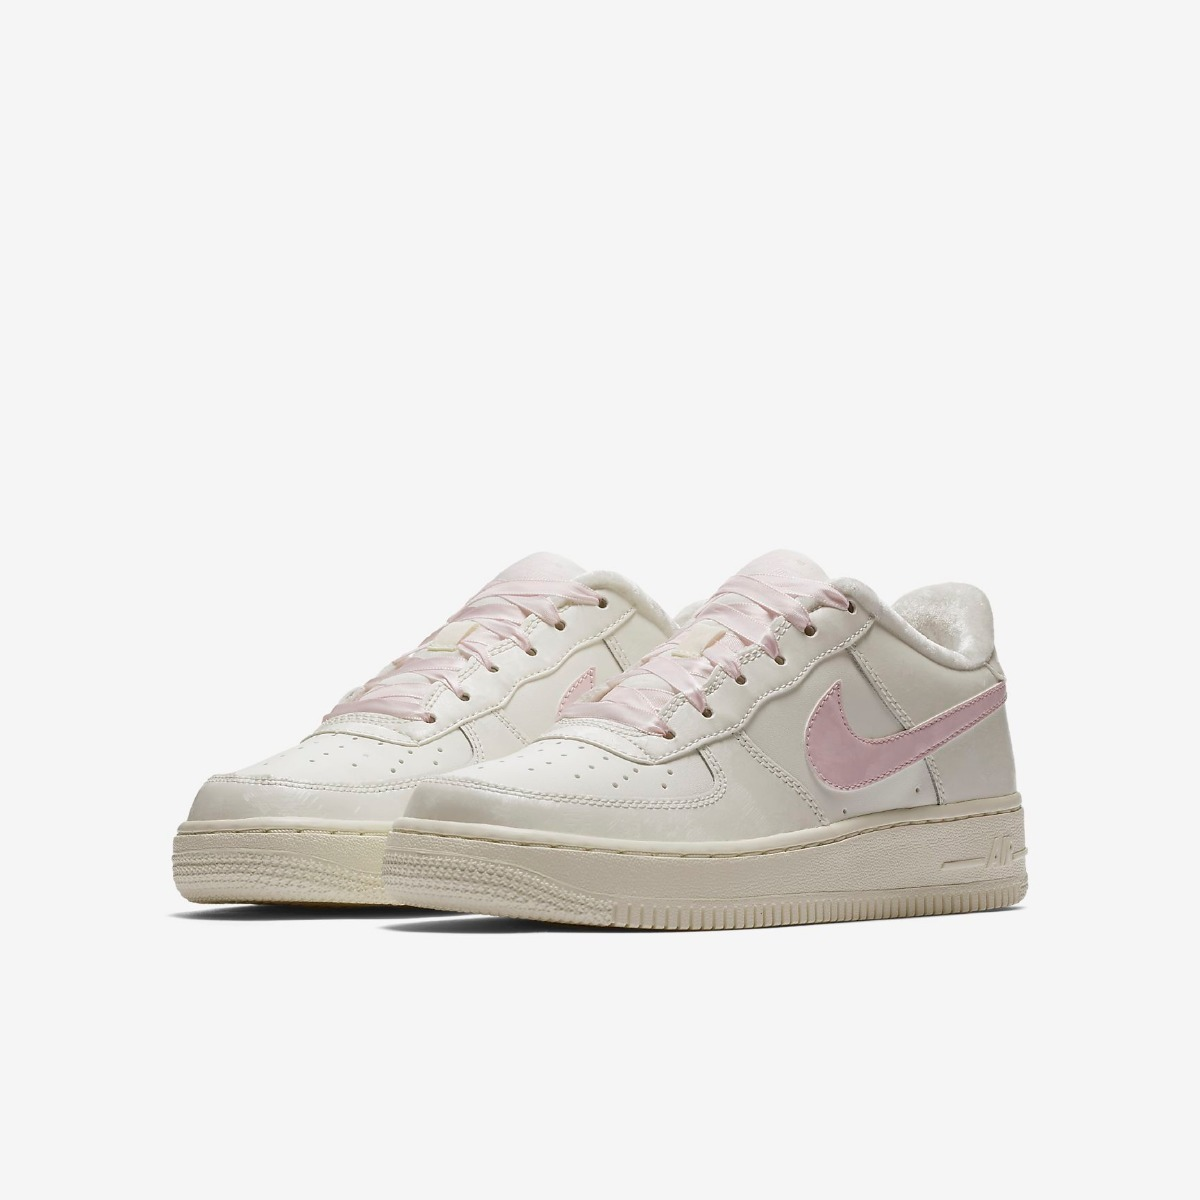 quality design d358d fd086 ... cheap zapatillas nike air force 1 low crema rosado rosa mujer 2018. cargando  zoom.